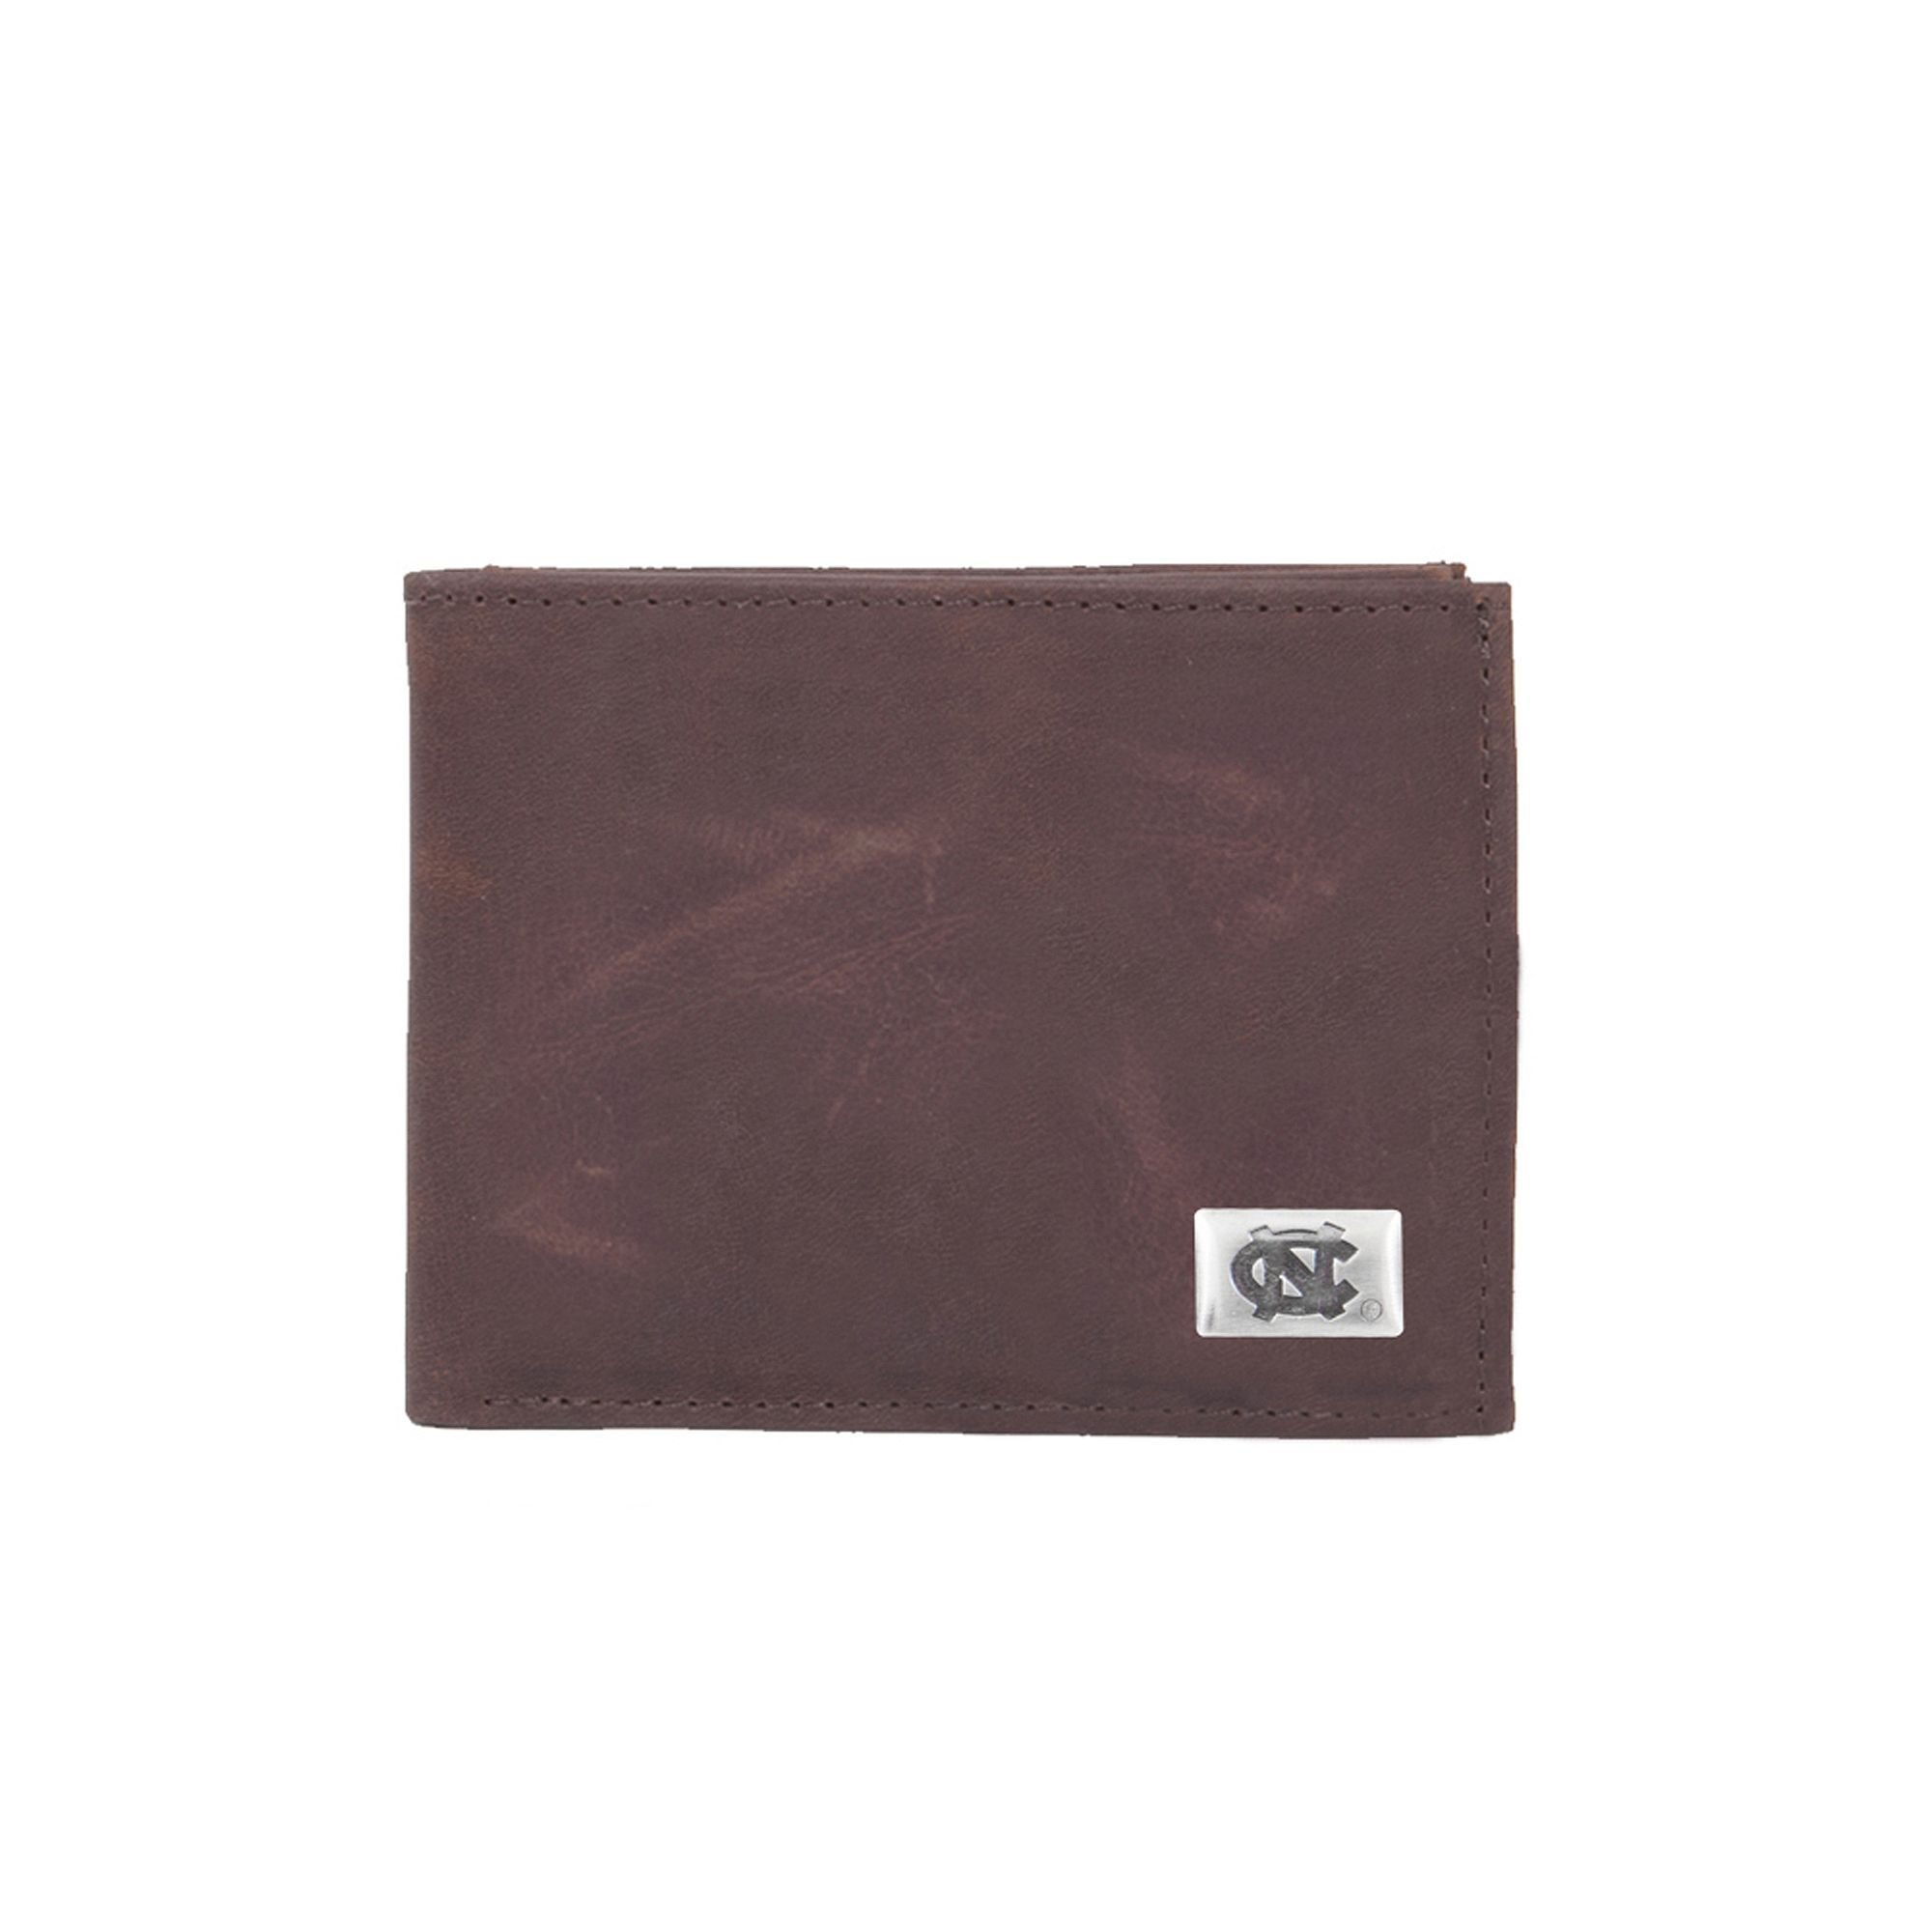 9503b167b5f7 North Carolina Tar Heels Leather Bifold Wallet | Products | Wallet ...